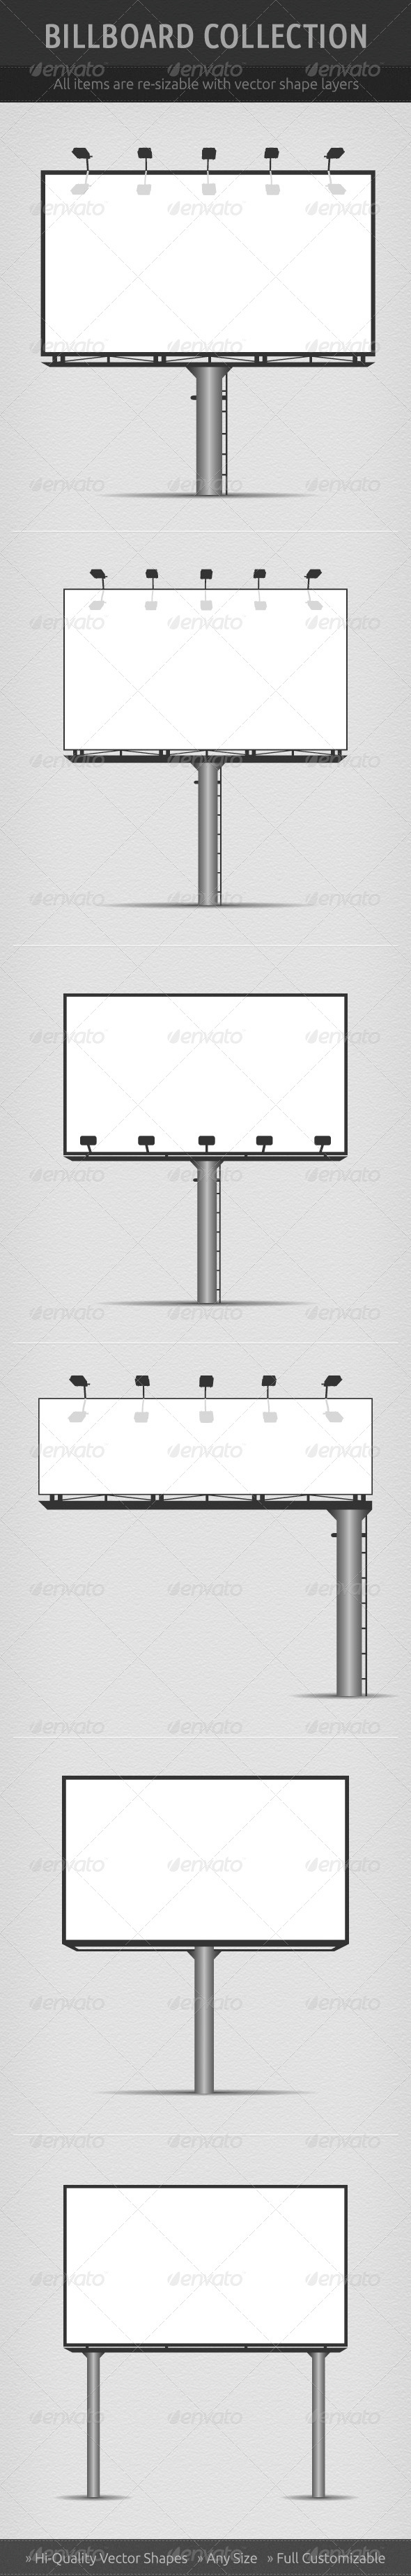 Vector Billboard Collection - Borders Decorative